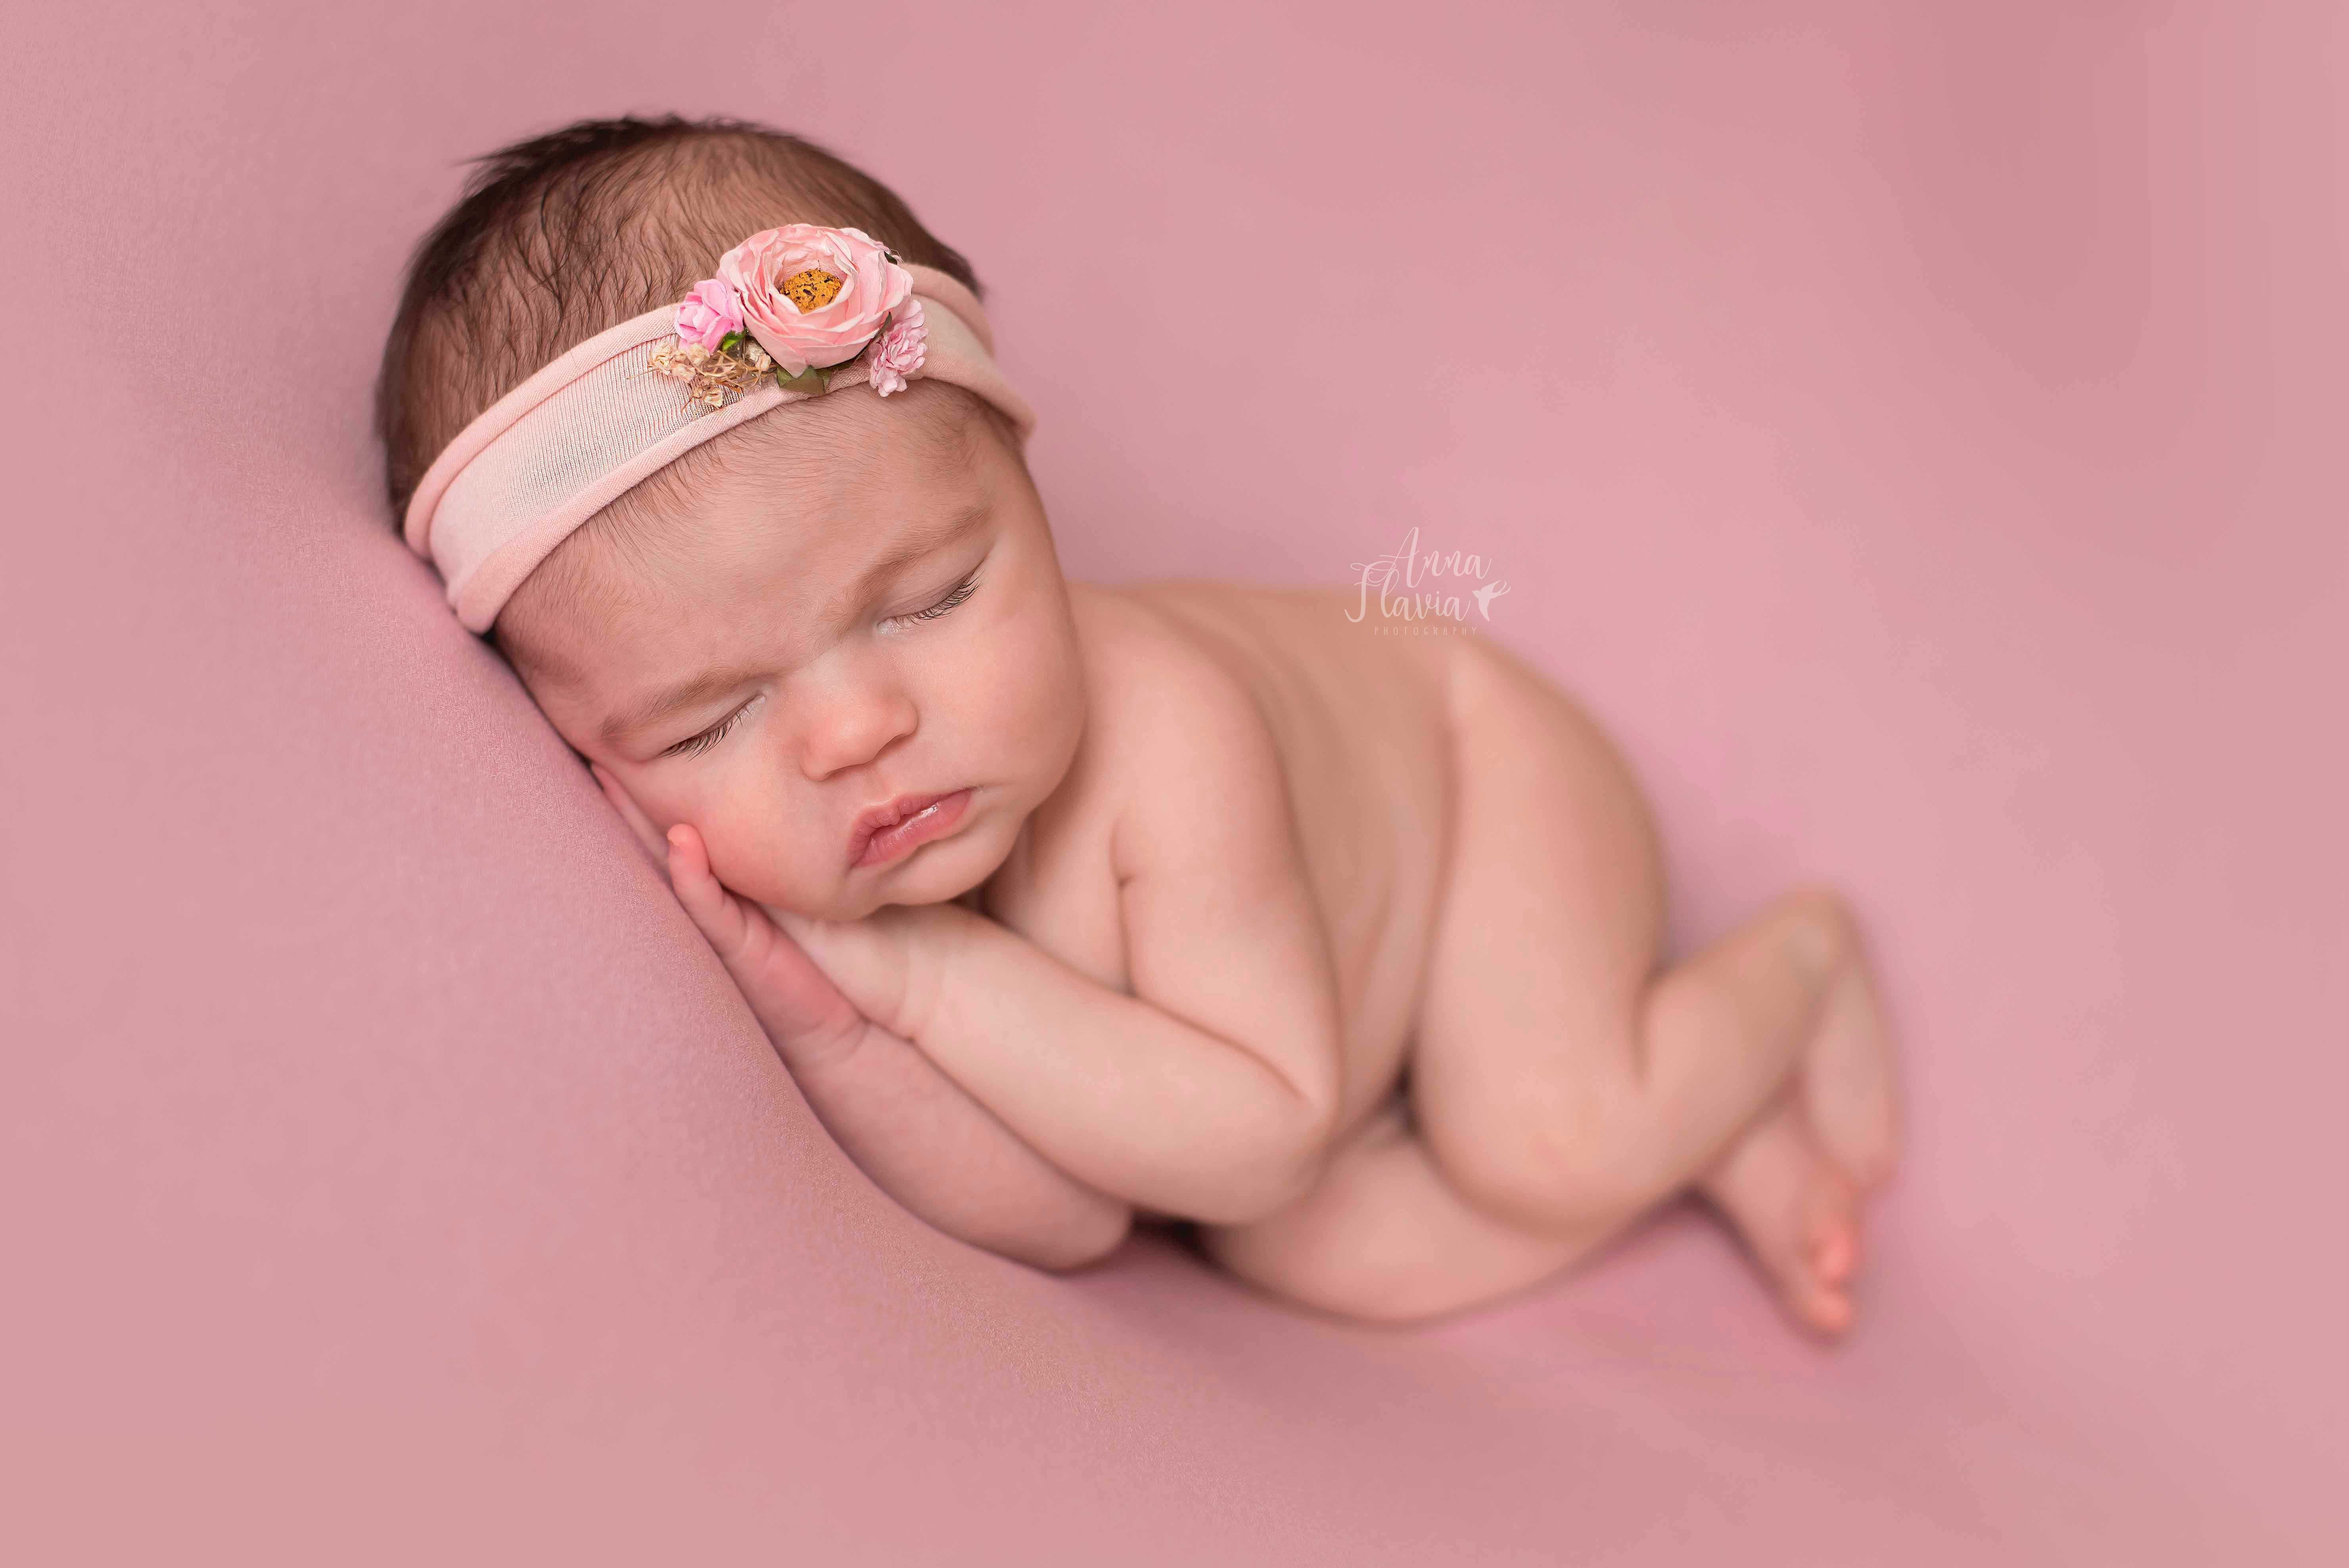 photographer_dublin_anna_flavia_newborn_maternity_16